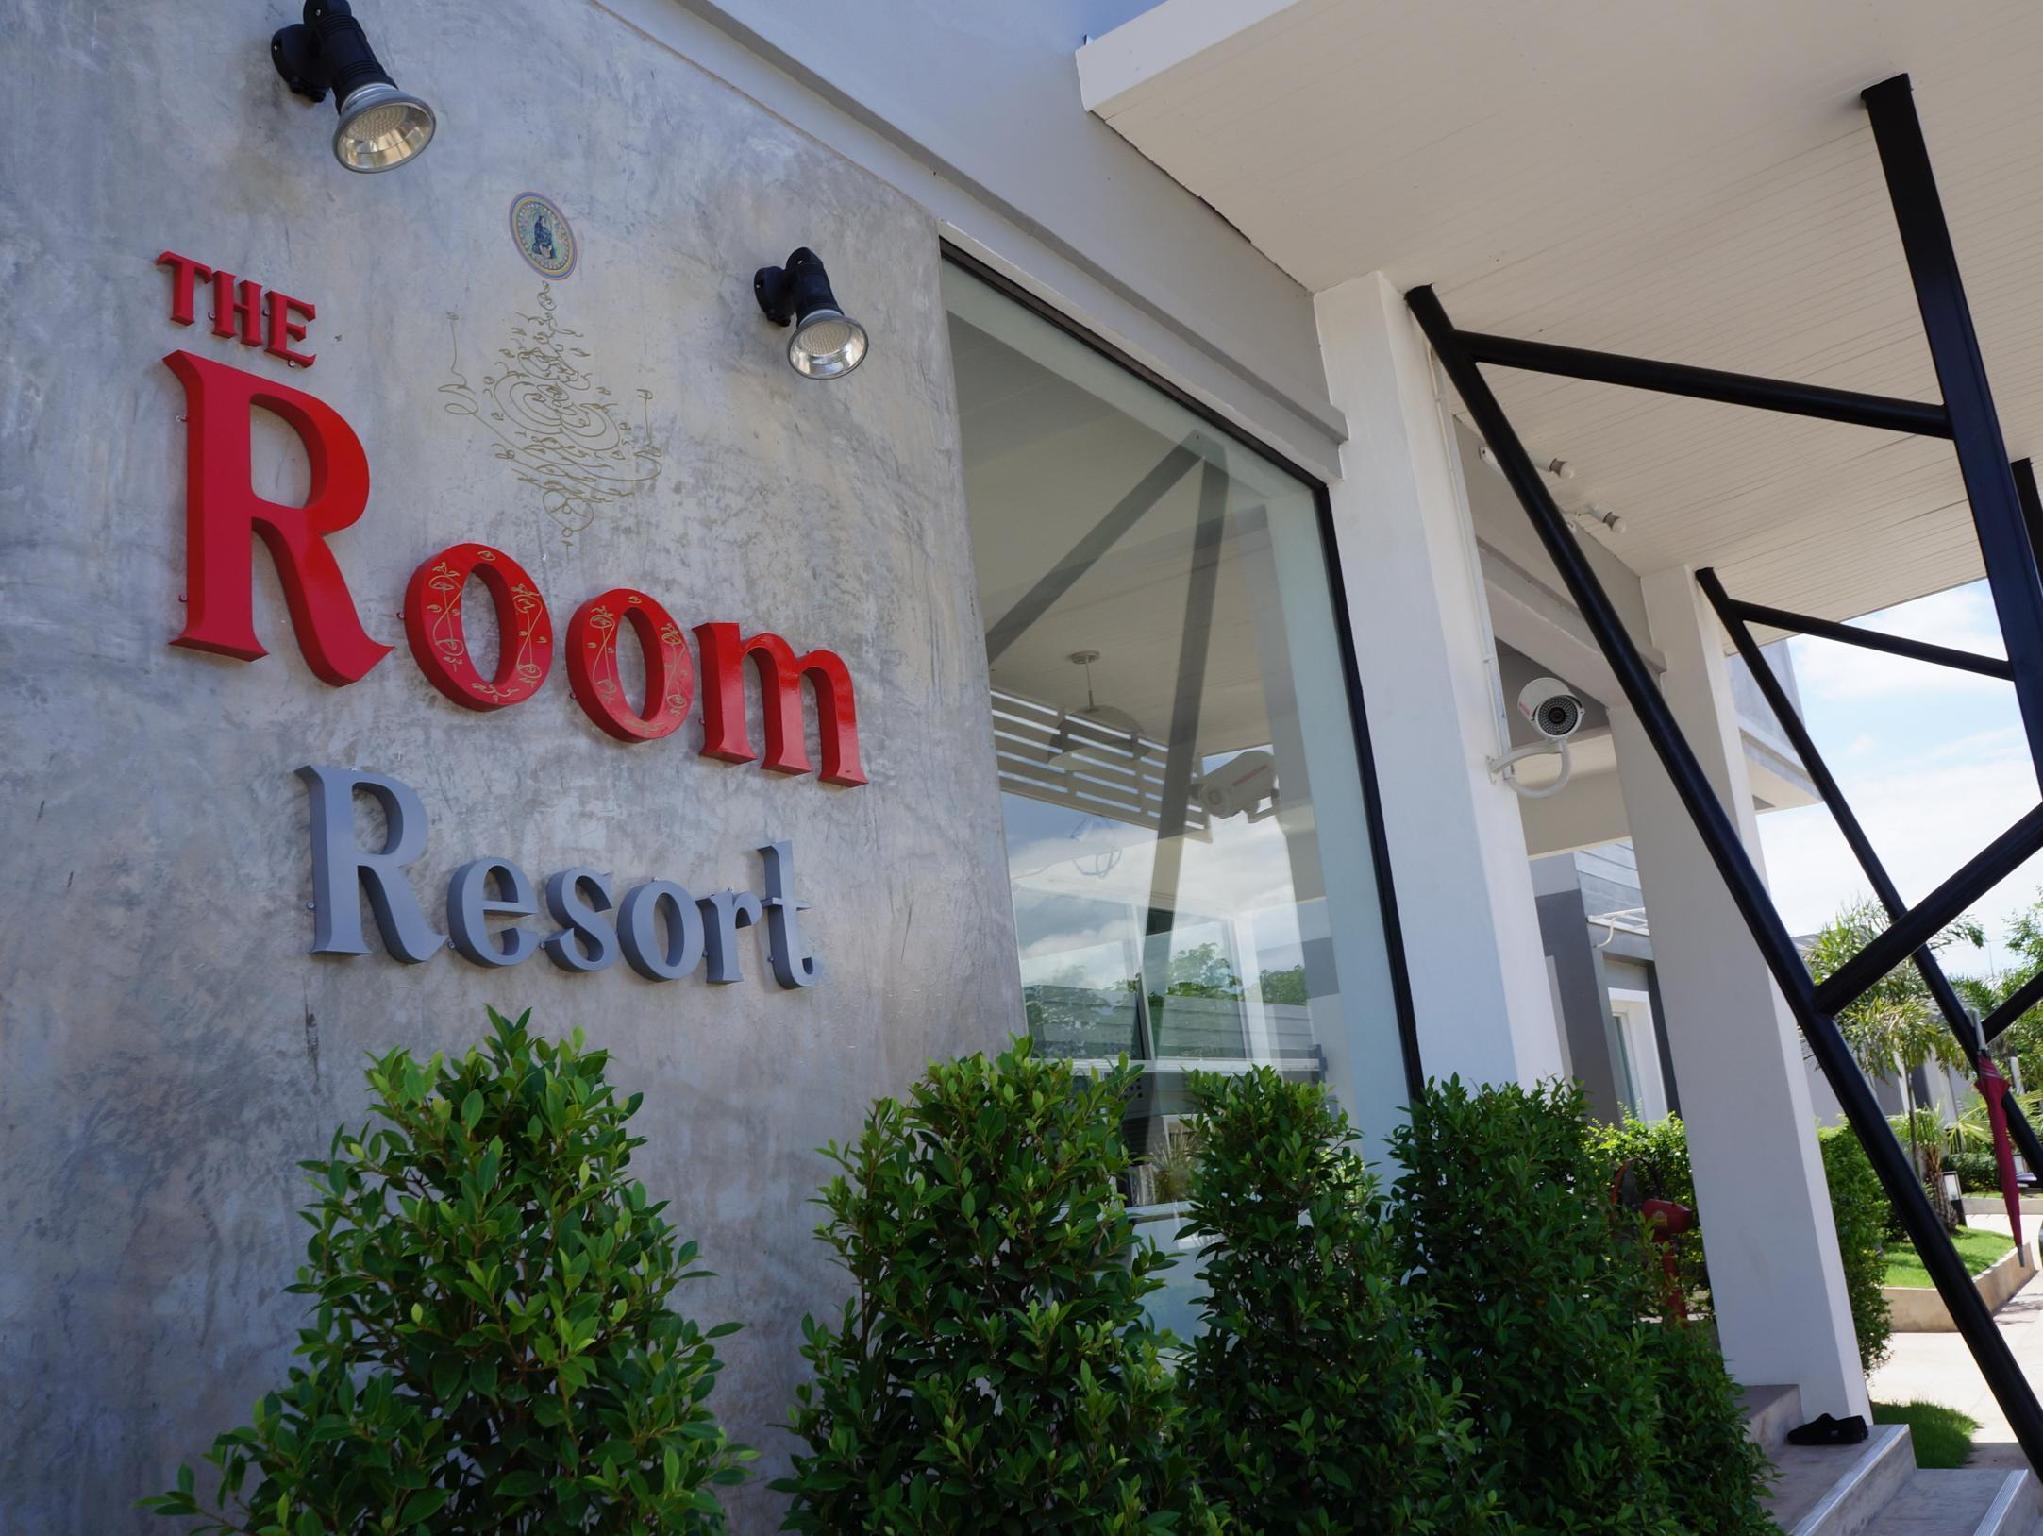 The Room Resort